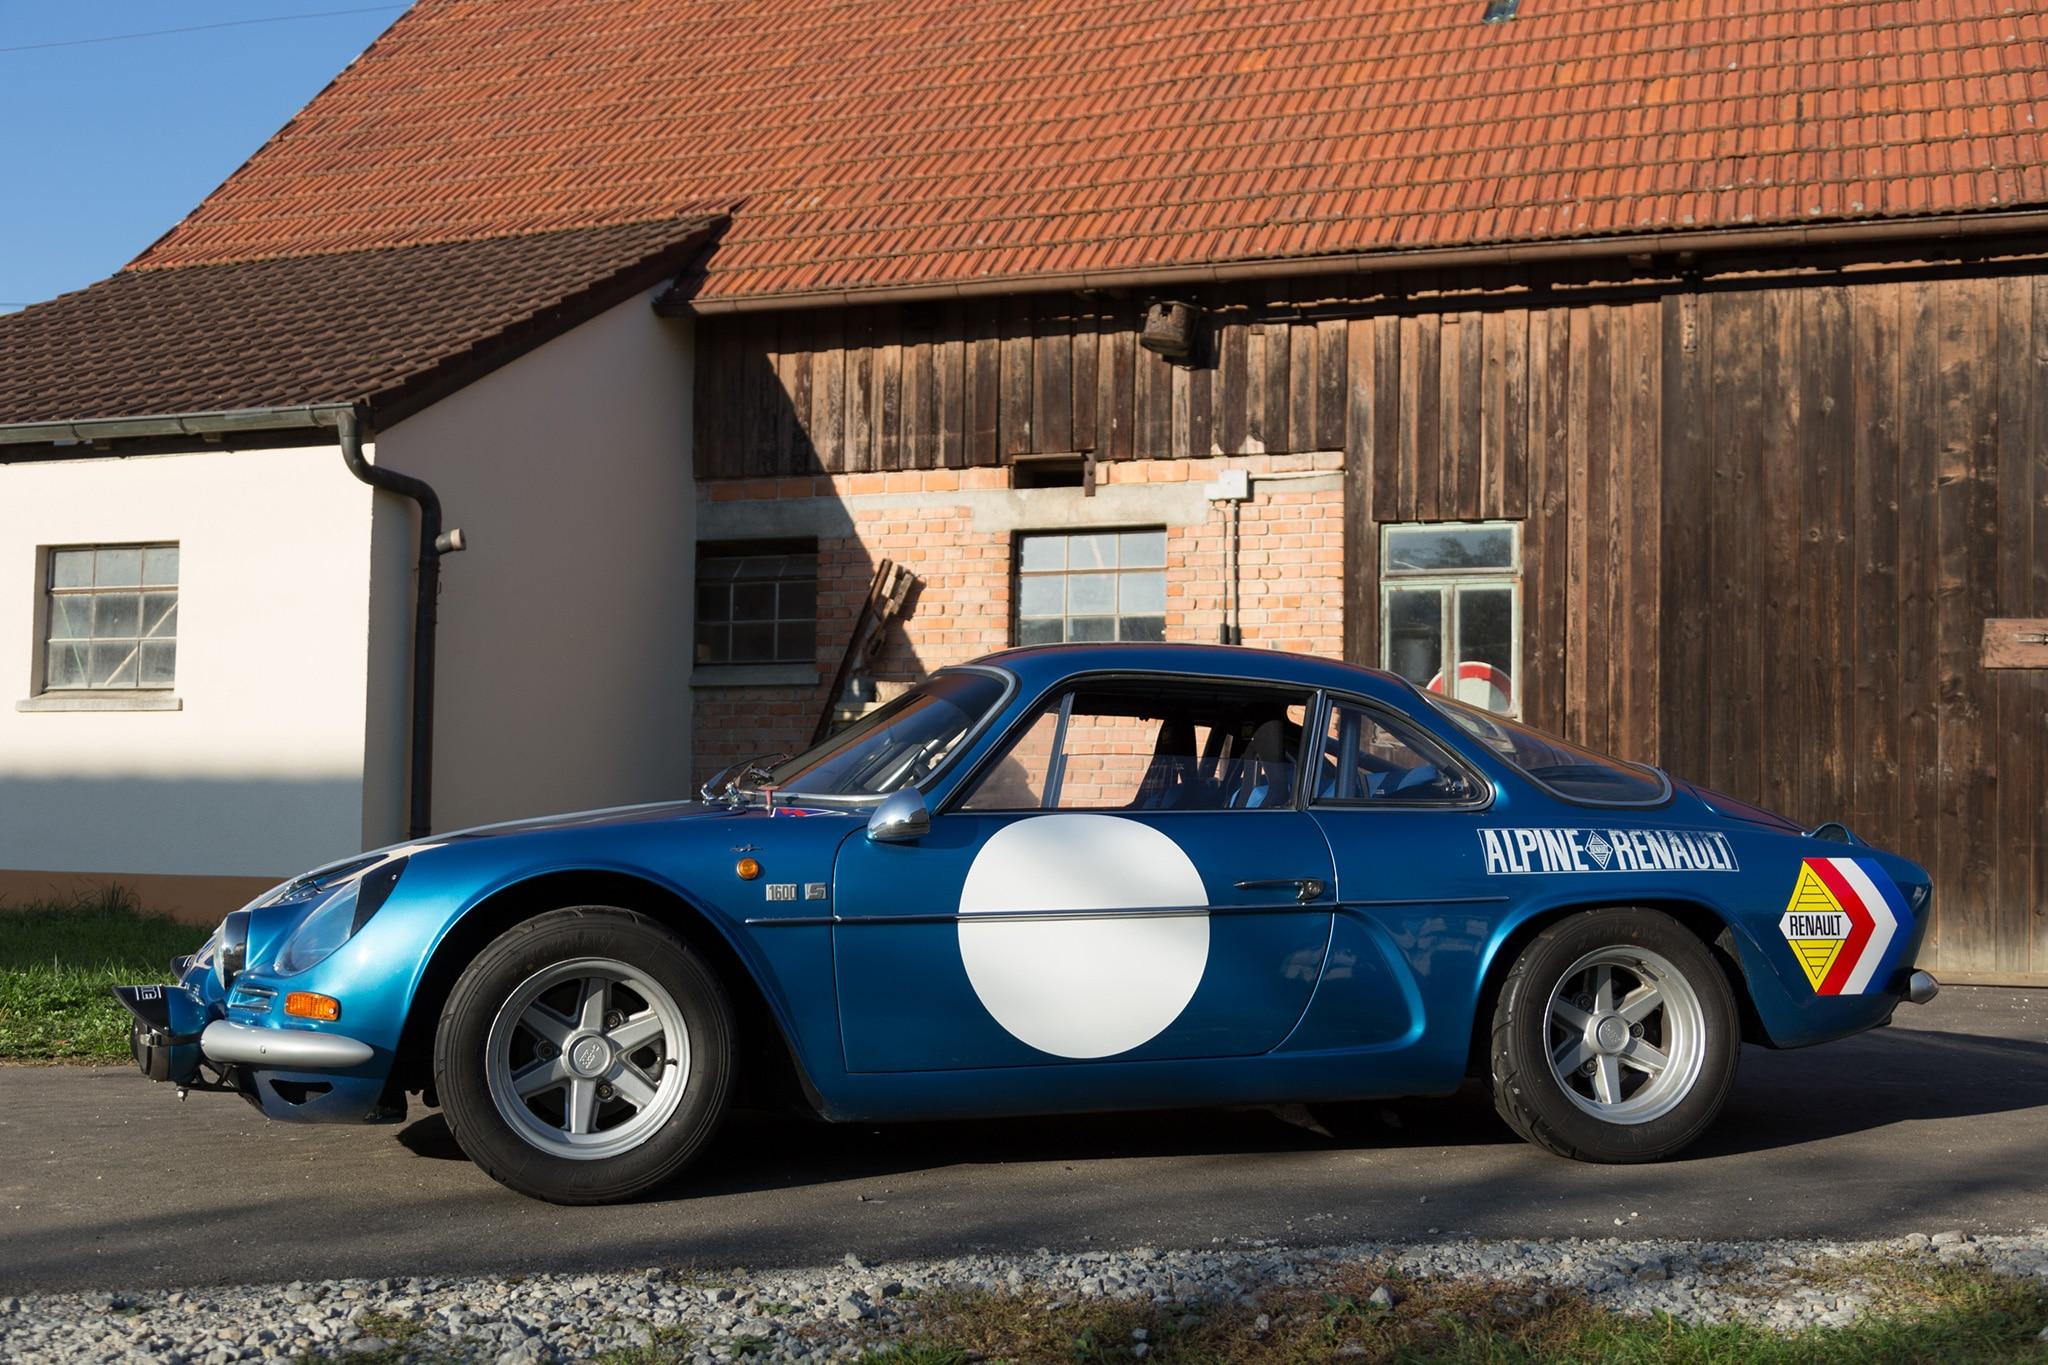 1971 Renault Alpine A110 1600S Petrolicious Side Profile 01